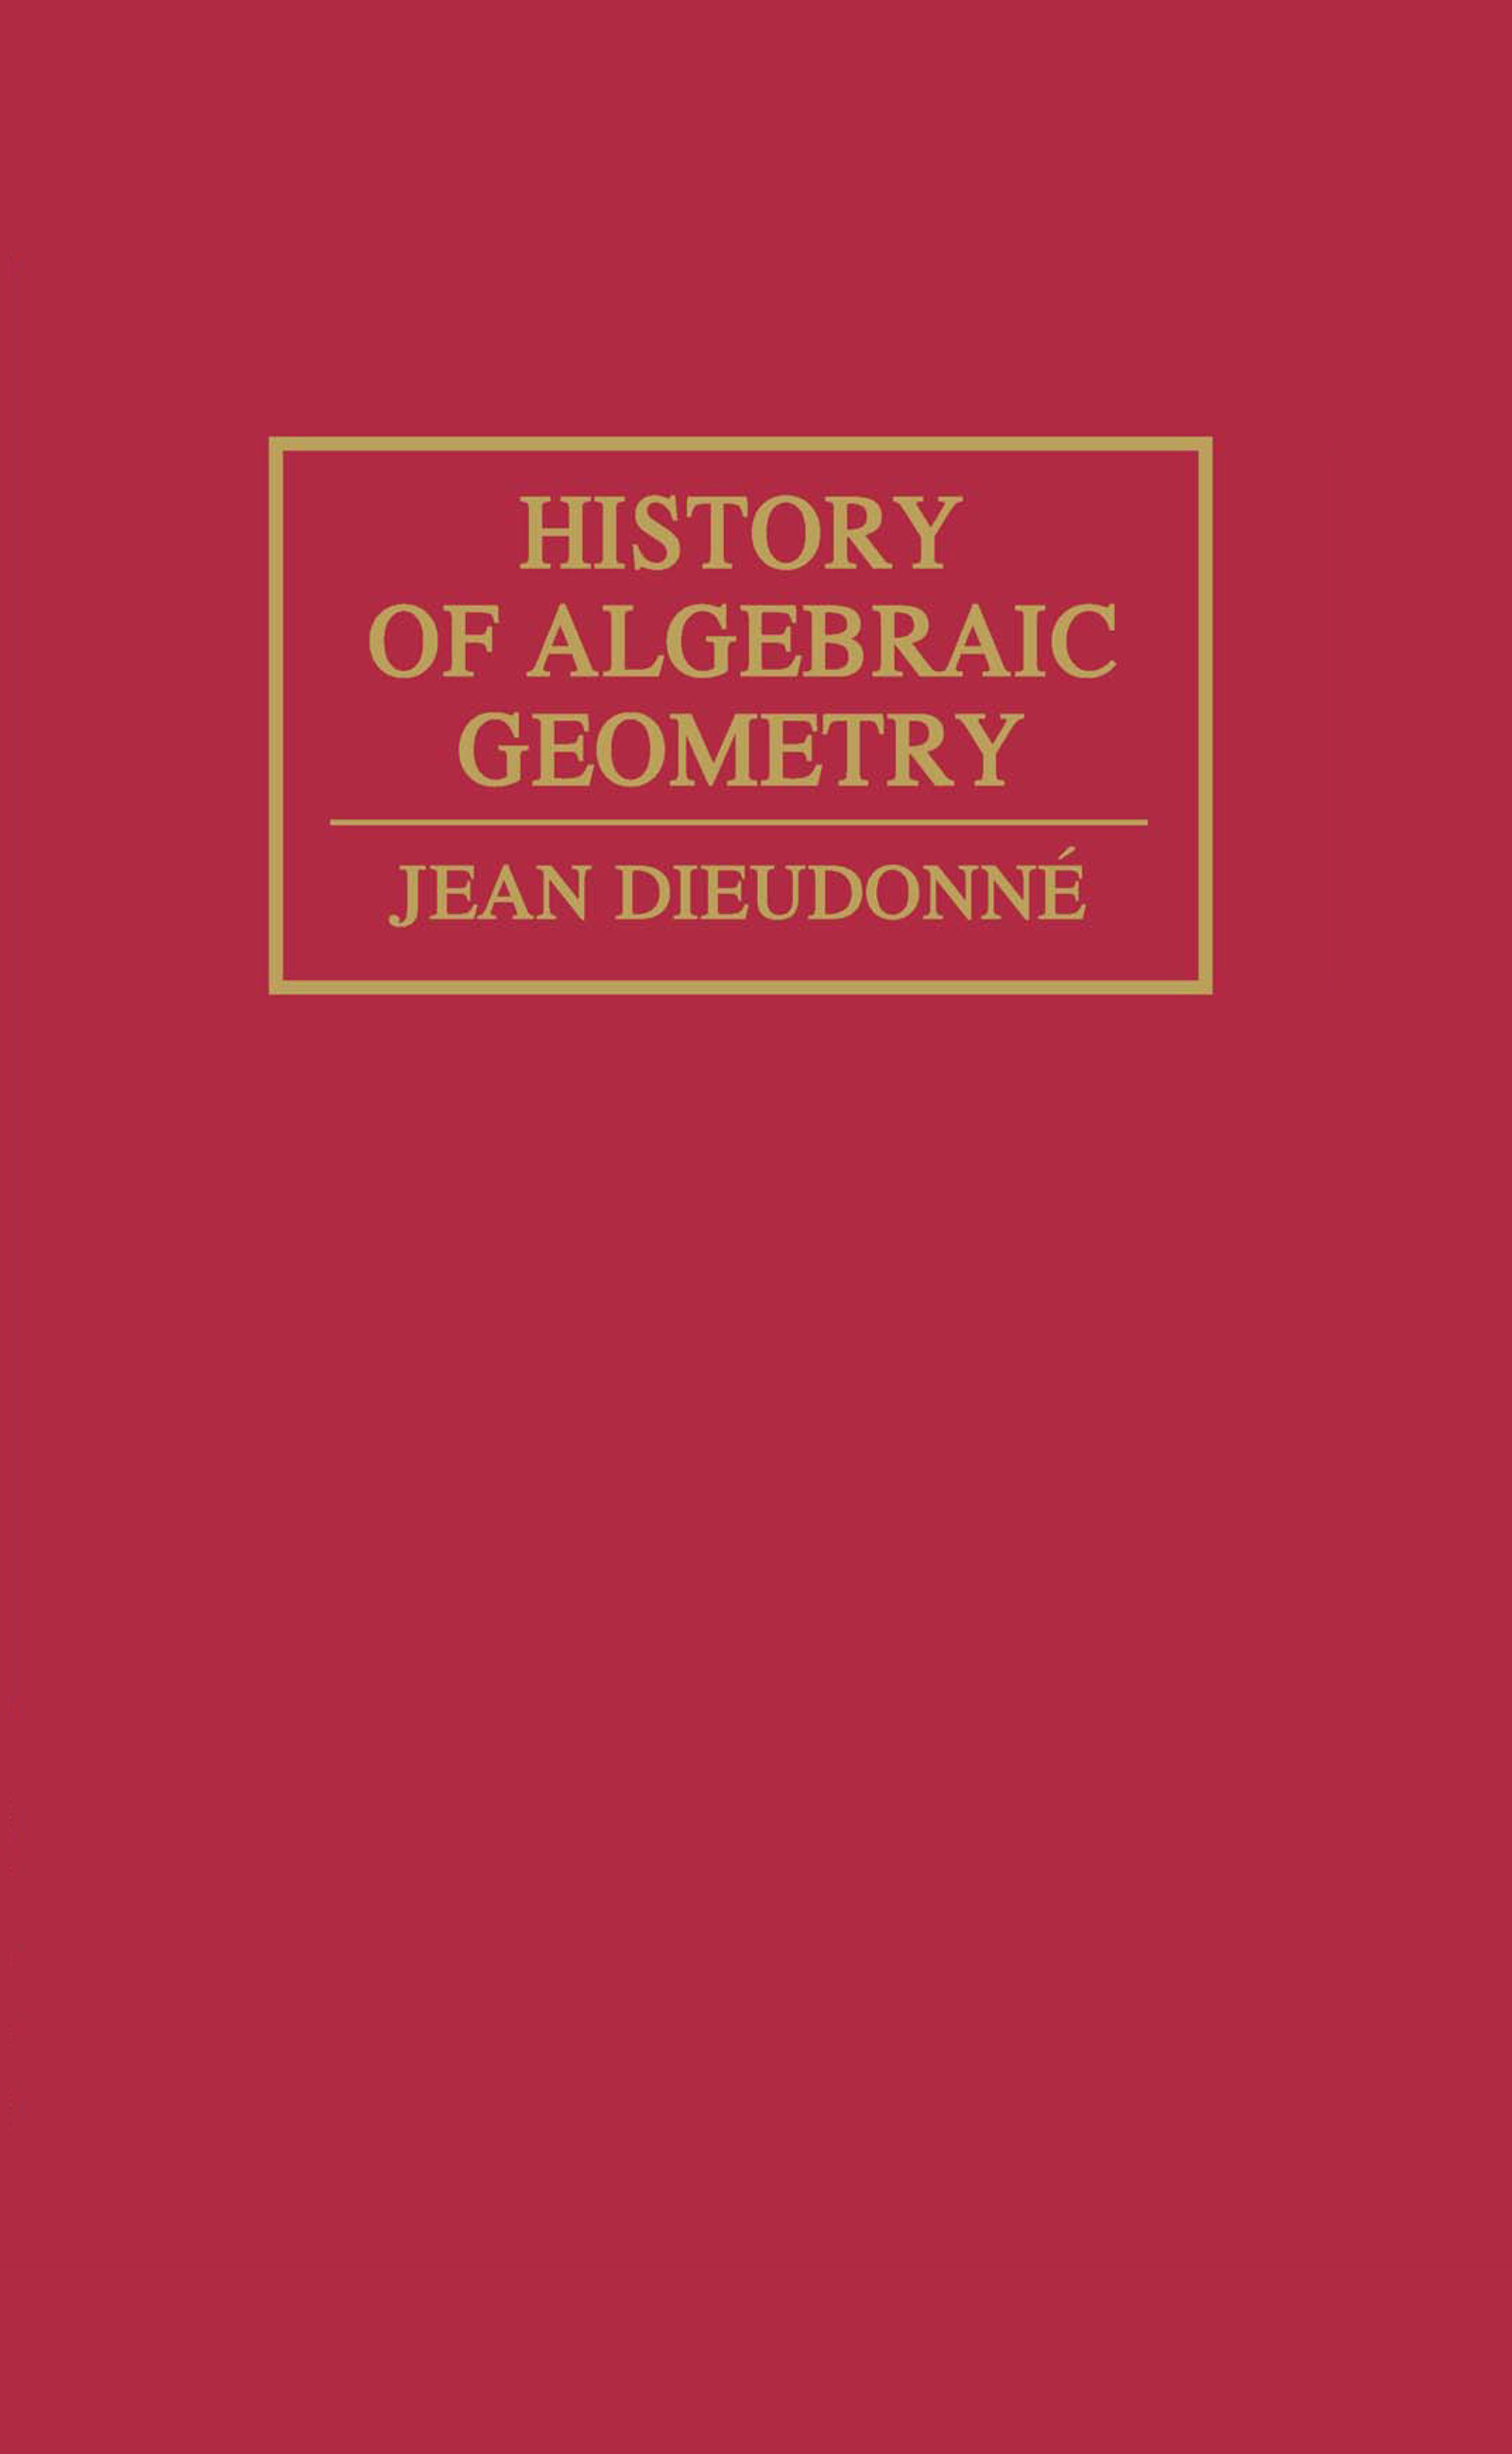 History Algebraic Geometry